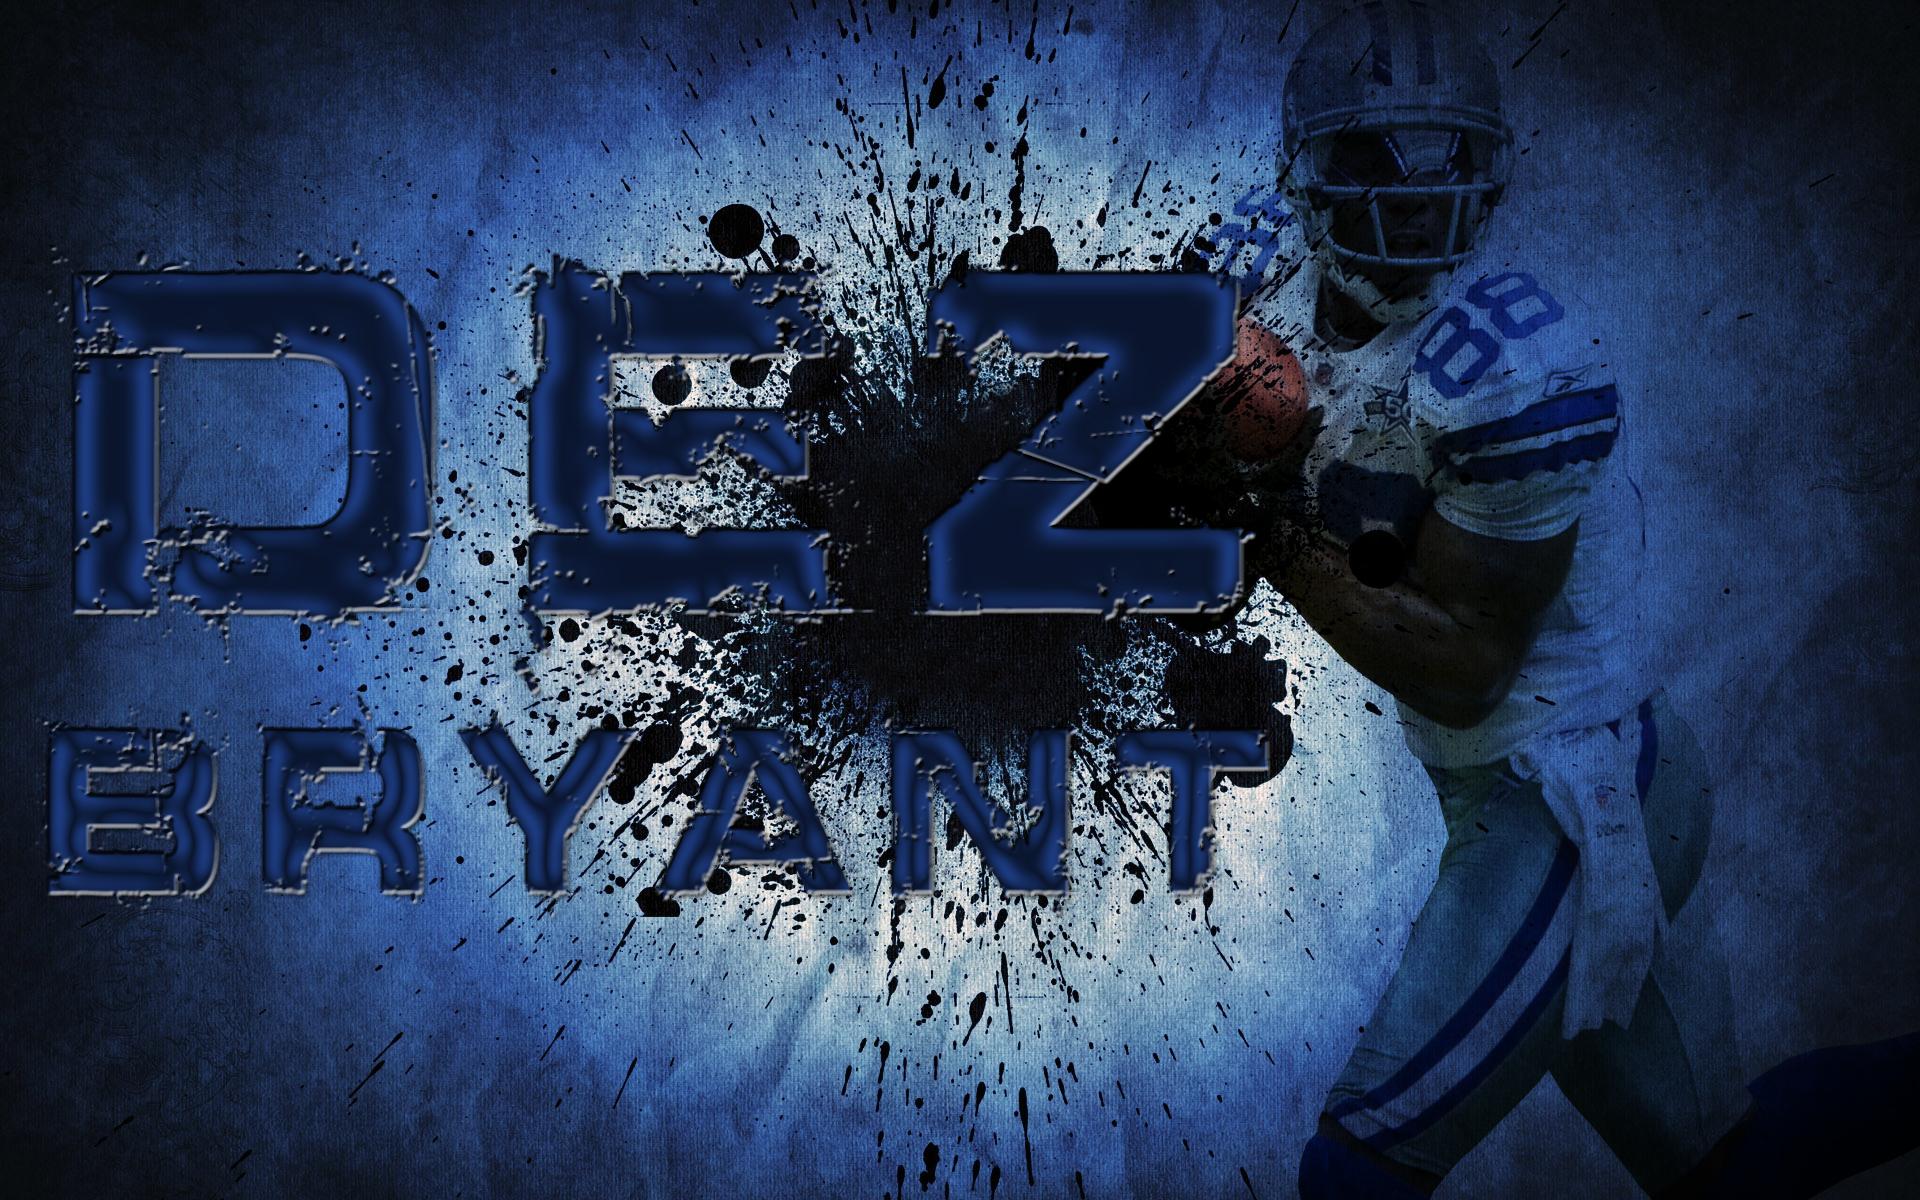 Dez Bryant Dallas Cowboys Wallpaper - Wallpaper - HD Wallpaper